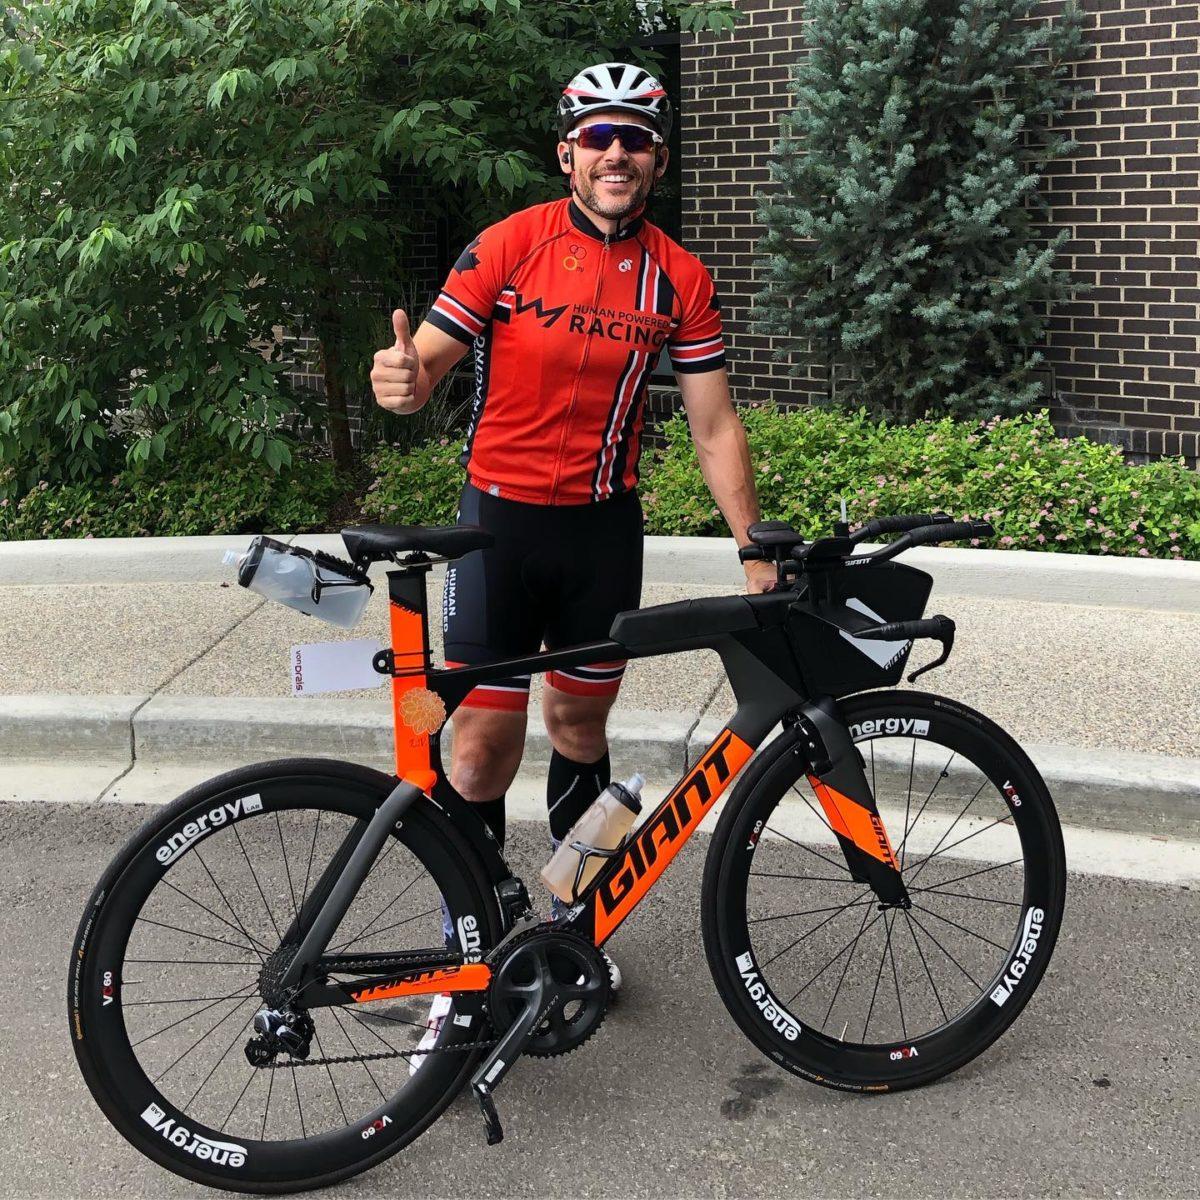 Chris Mavrikos athlete standing in front of his bike before Calgary 70.3